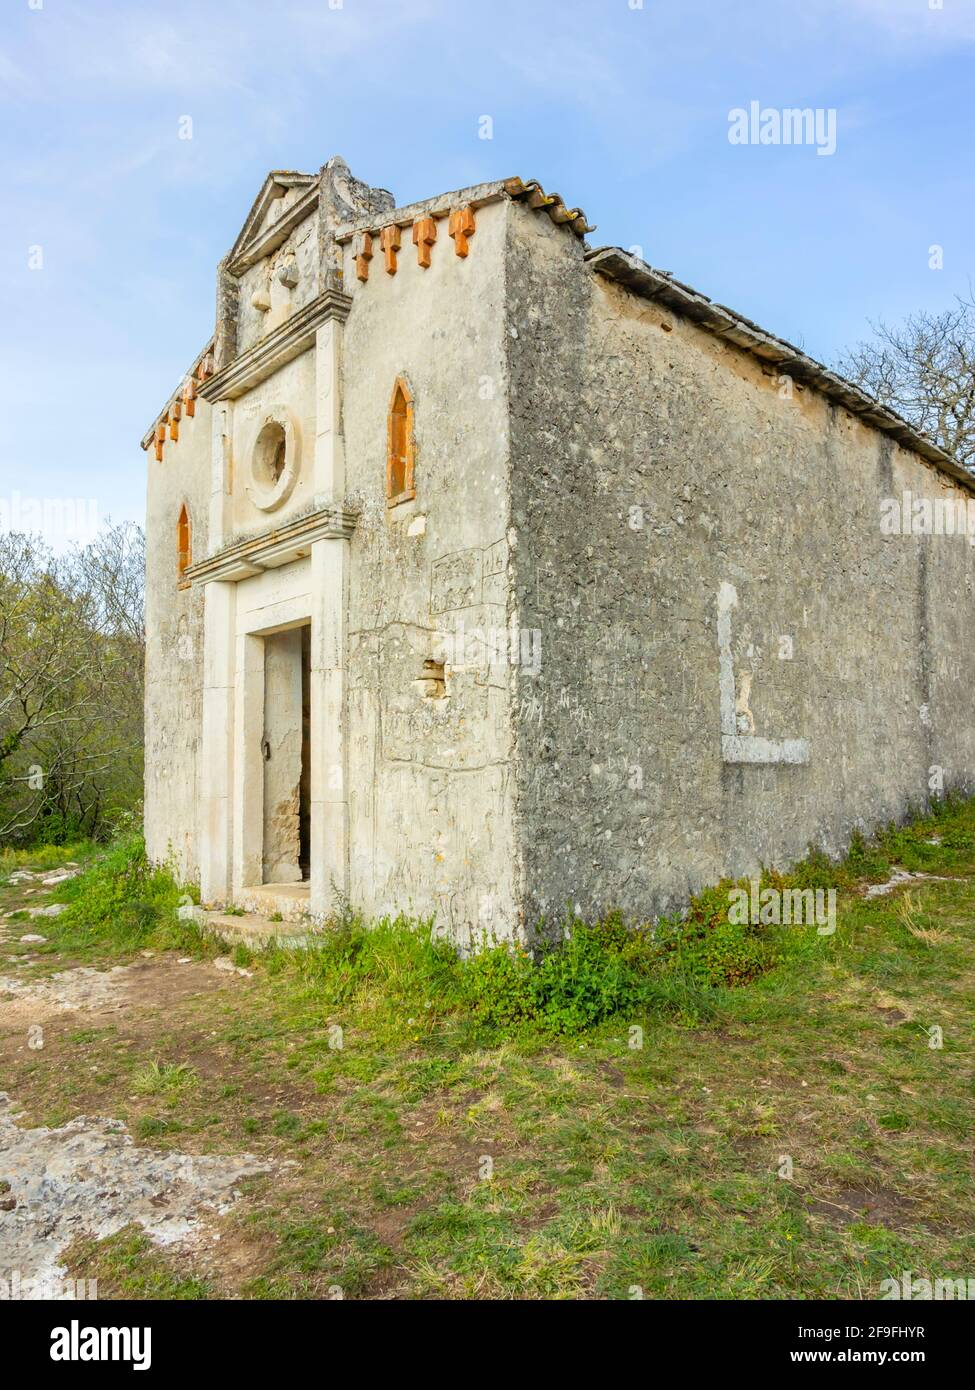 Exterior of Church St Saint Peter on peak crkva Svetog Petra apostola na vrhu on rock between Krancici and Bale in Istria in Croatia Europe Stock Photo